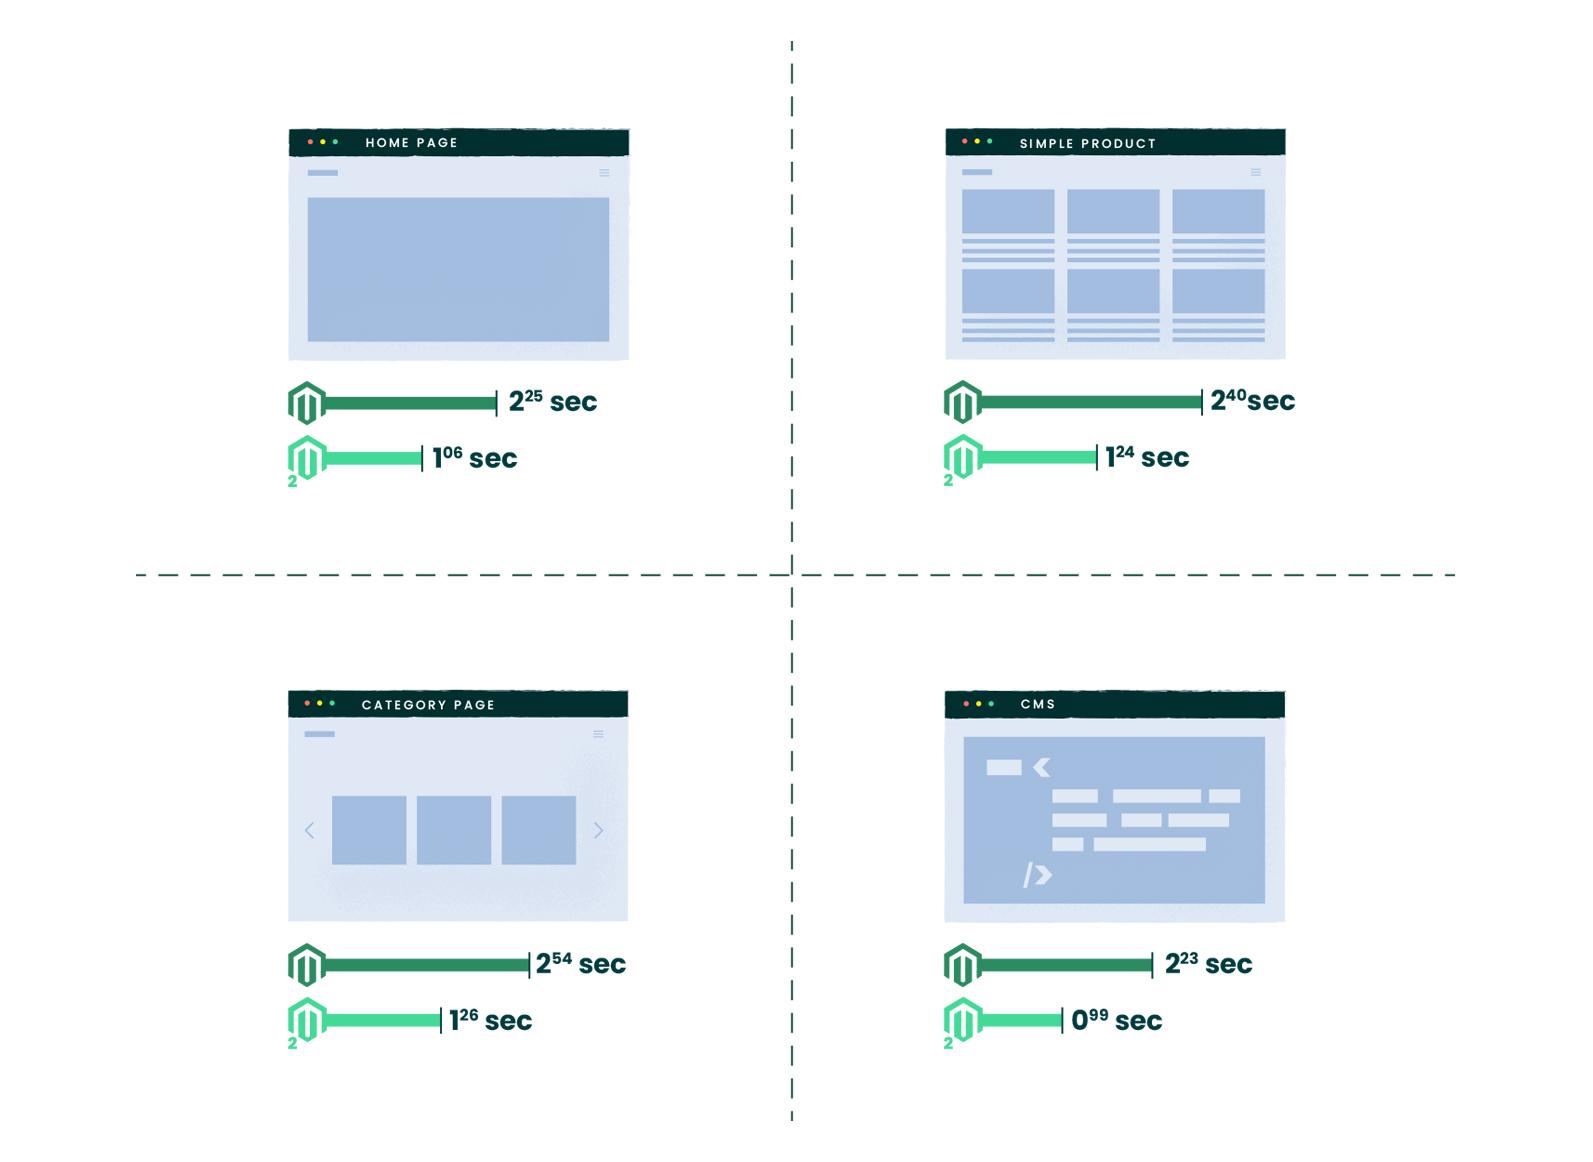 Magento 1 and Magento 2 Website Speed Comparison